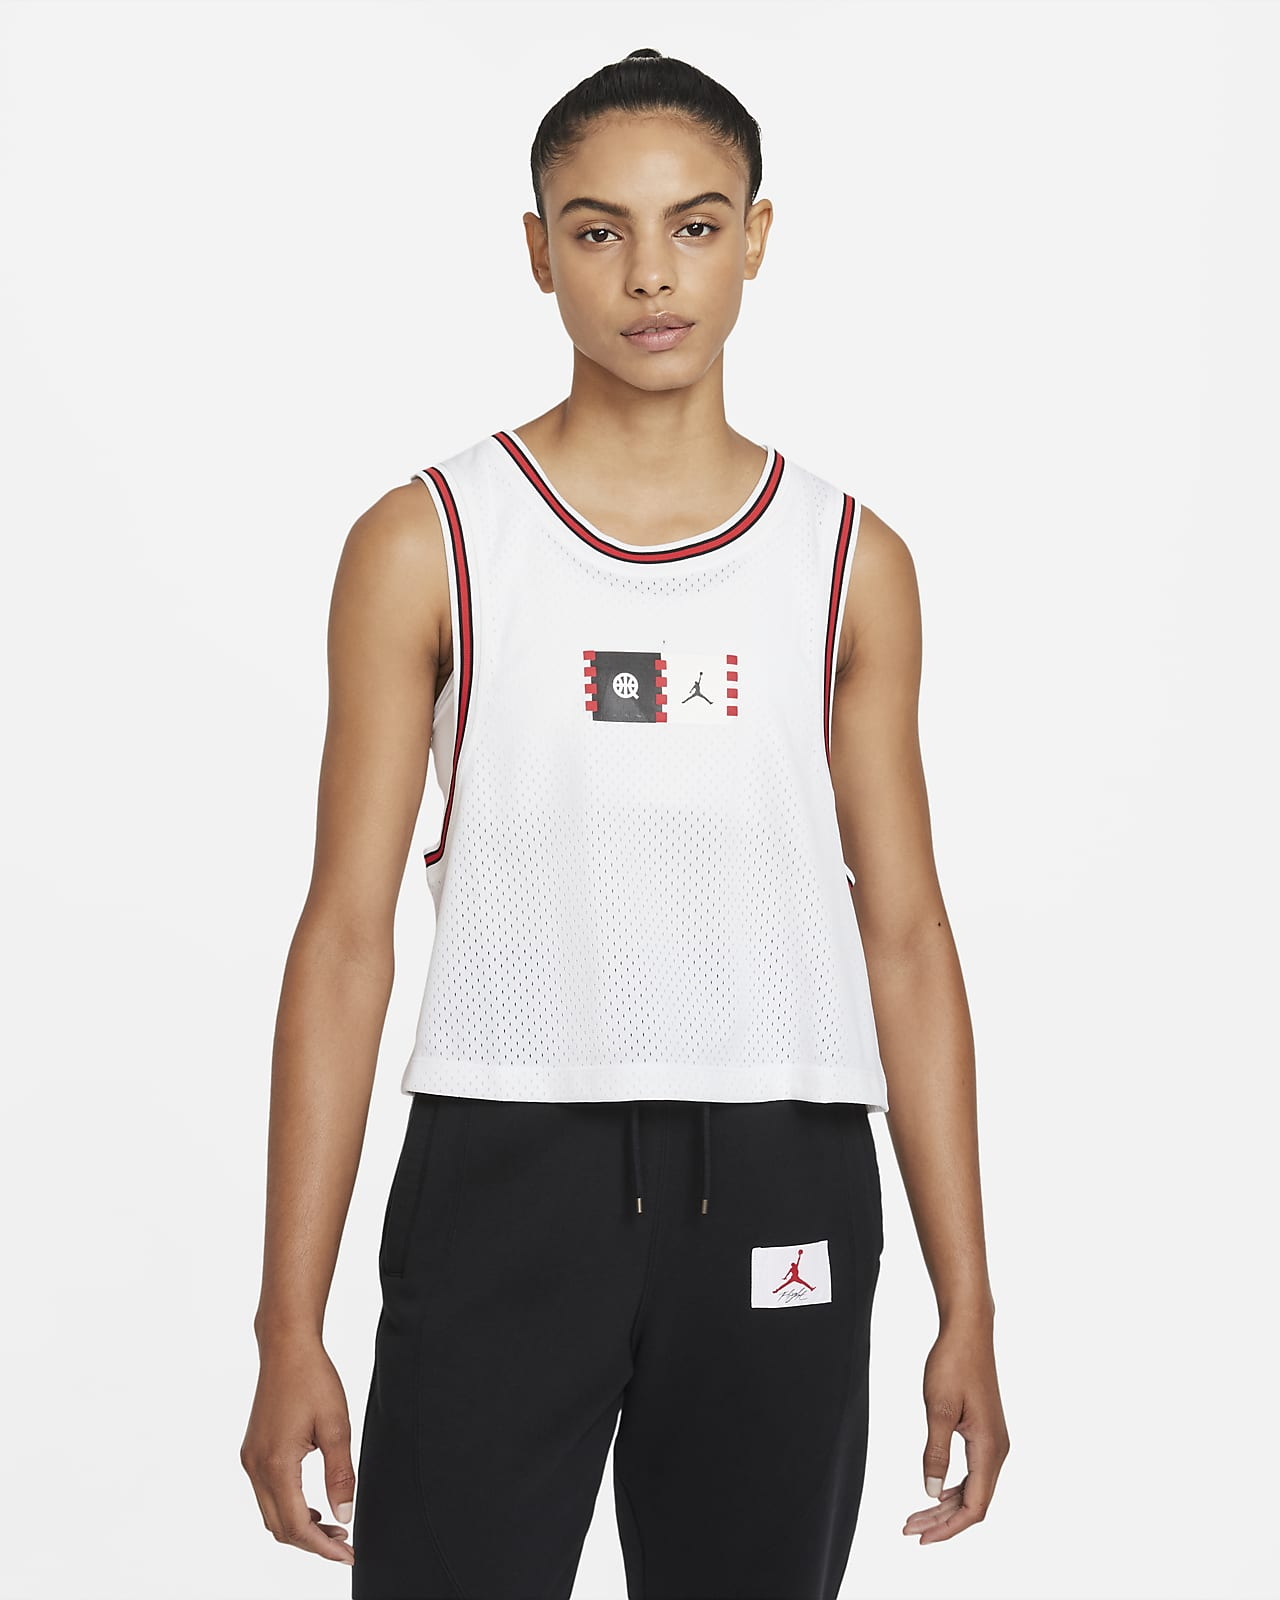 Maillot Jordan Quai 54 Essential pour Femme